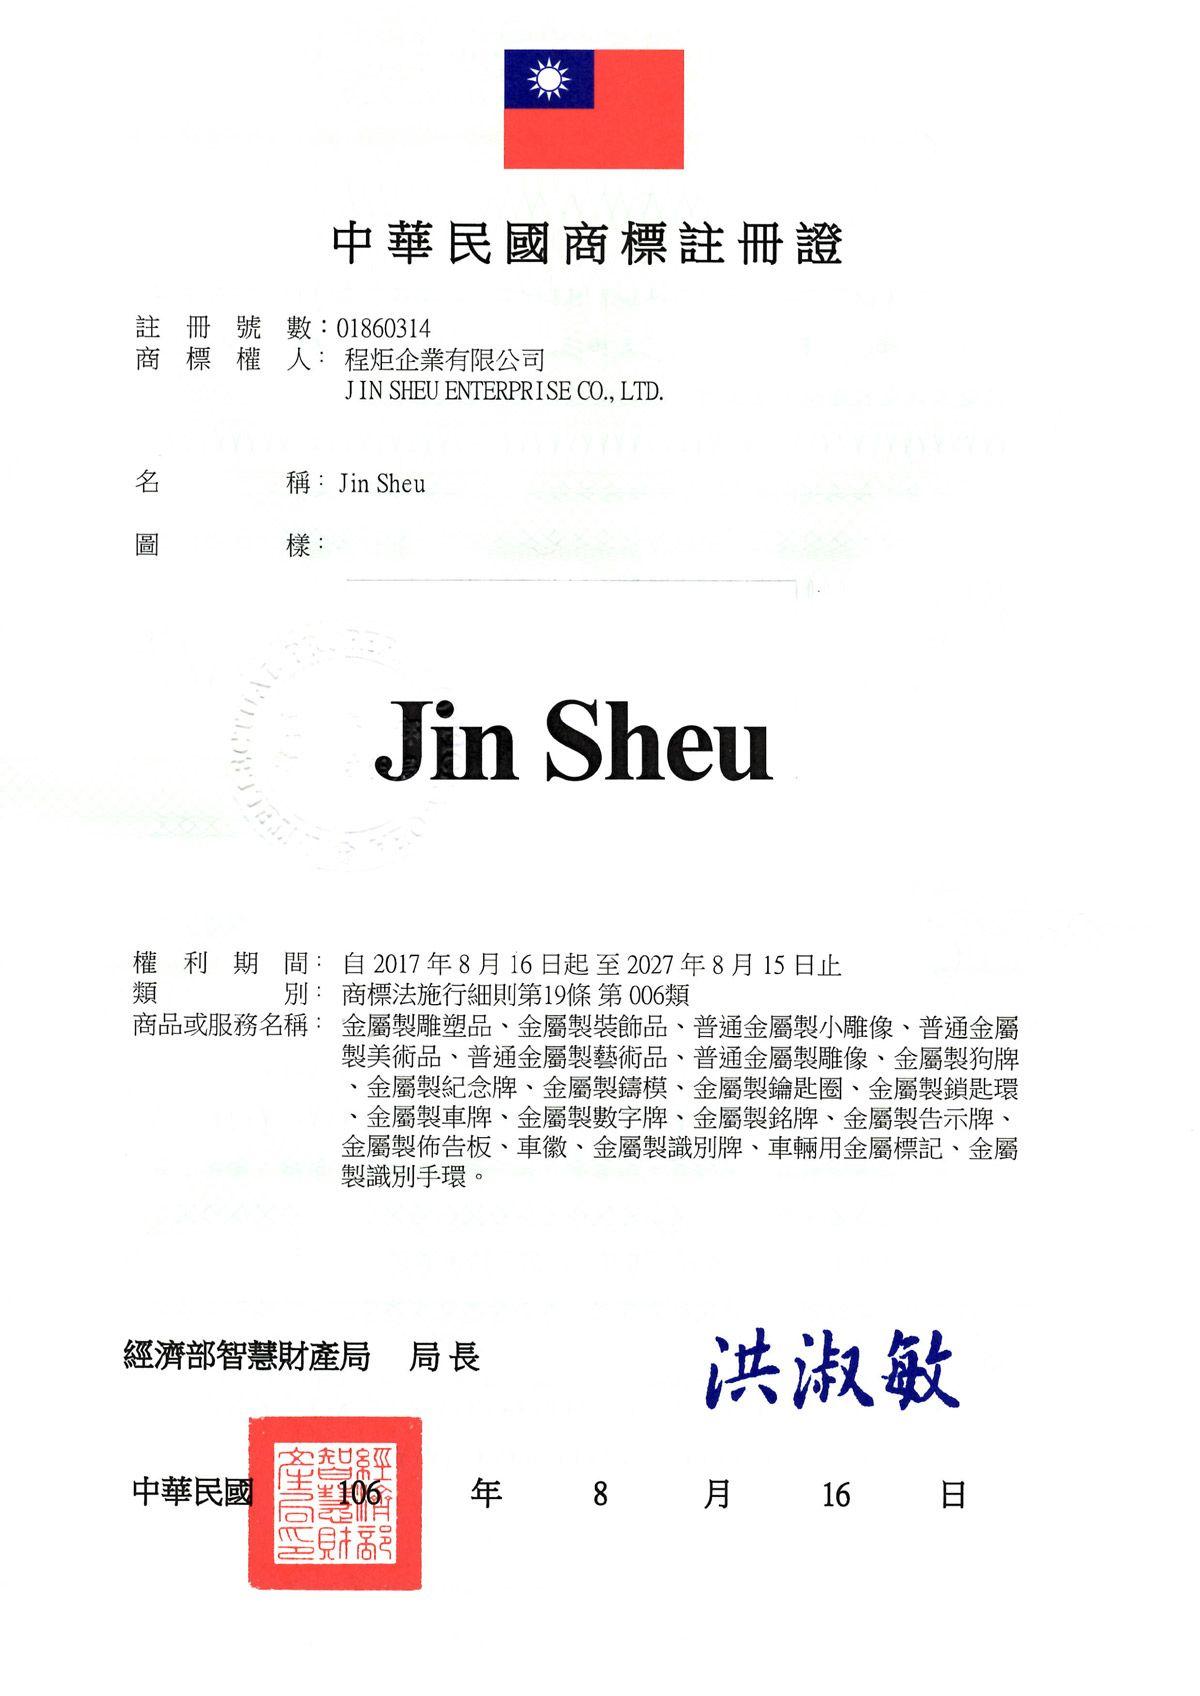 Jinsheu Warenzeichen